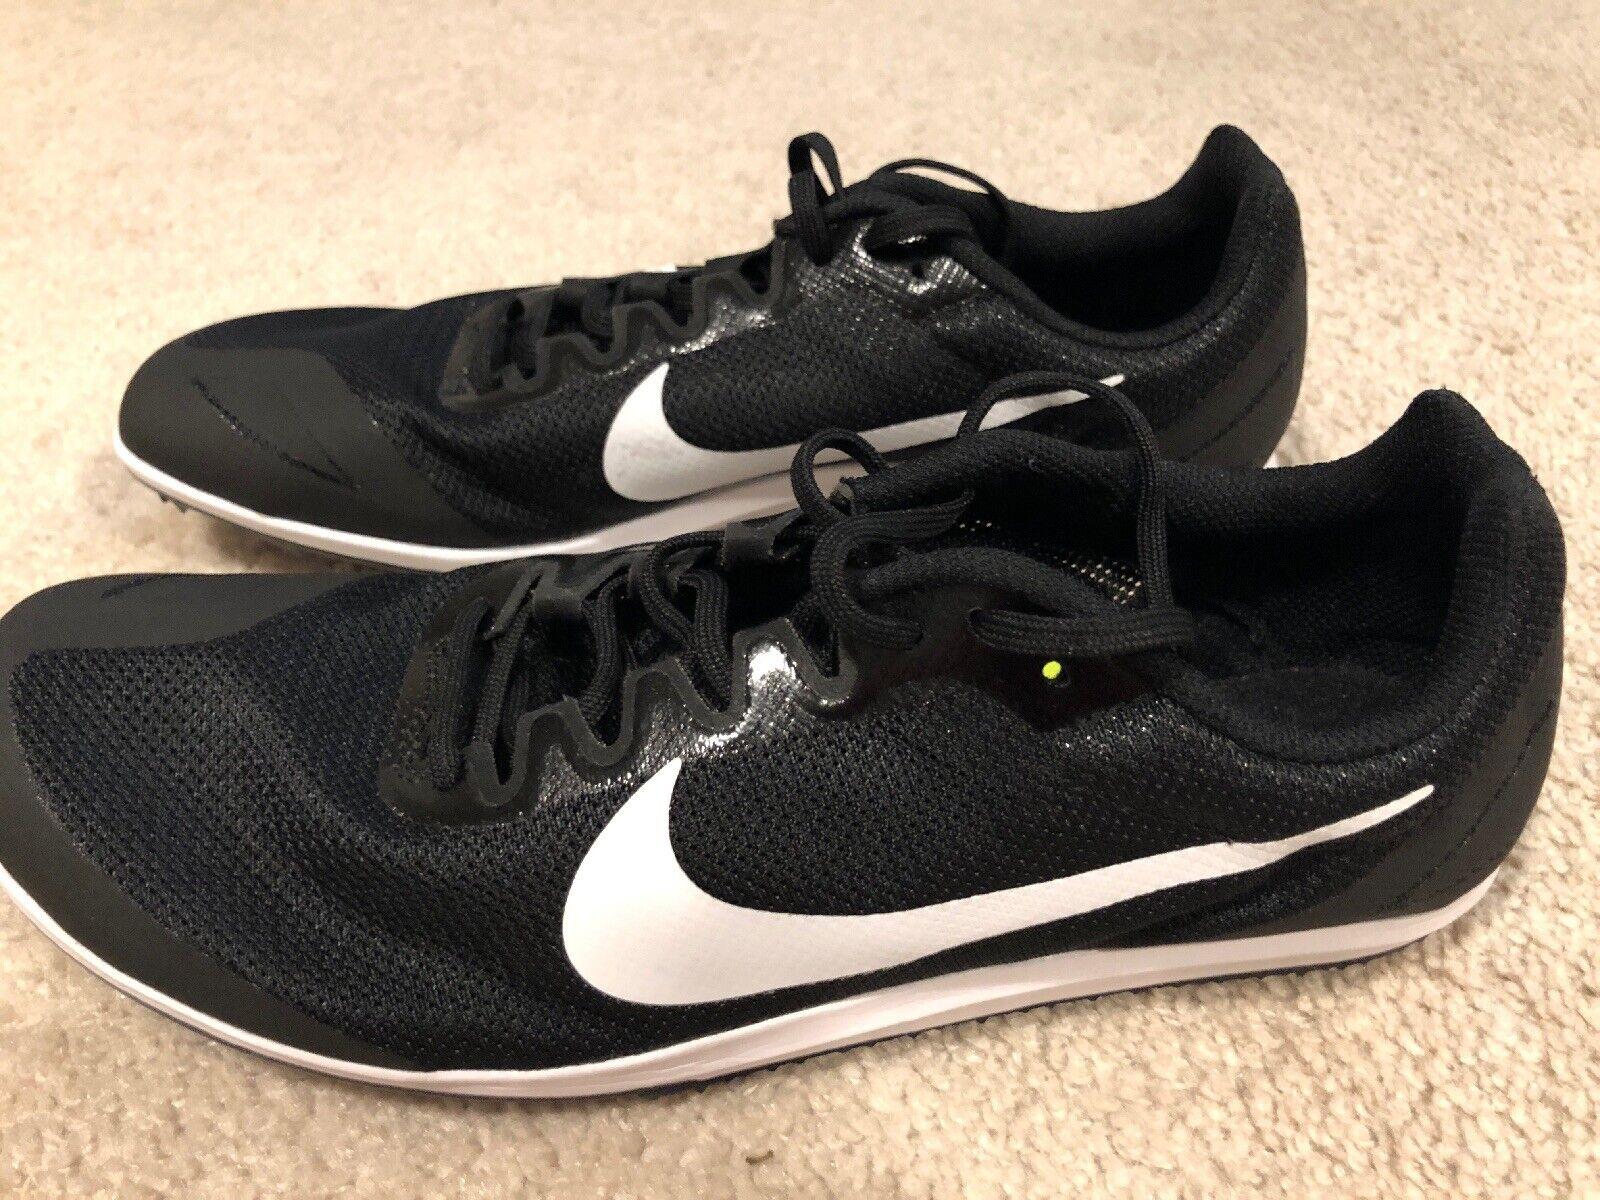 NWOB Nike Zoom Rival D 10 Distance Track Spike Men's US 12 Black White